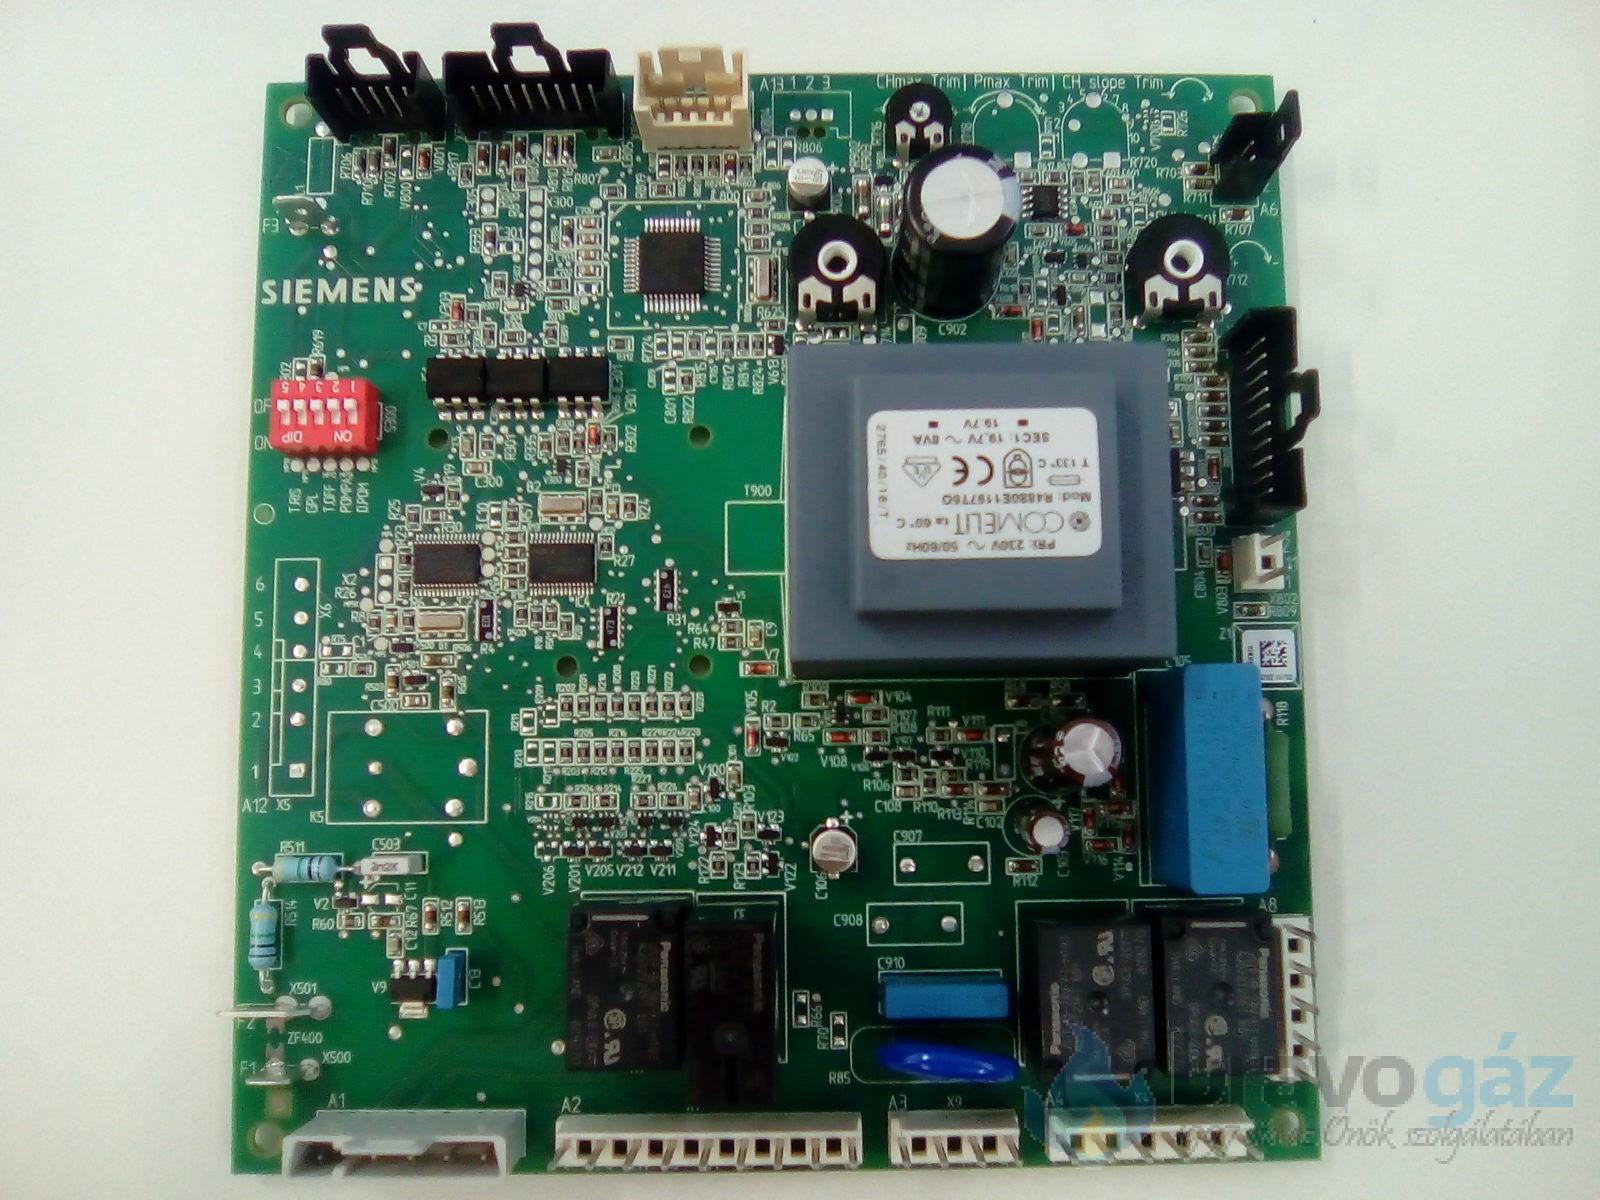 BAXI vezérlőpanel LMU33 Siemens (Régi: 5661740, 5669060) - JJJ005678250